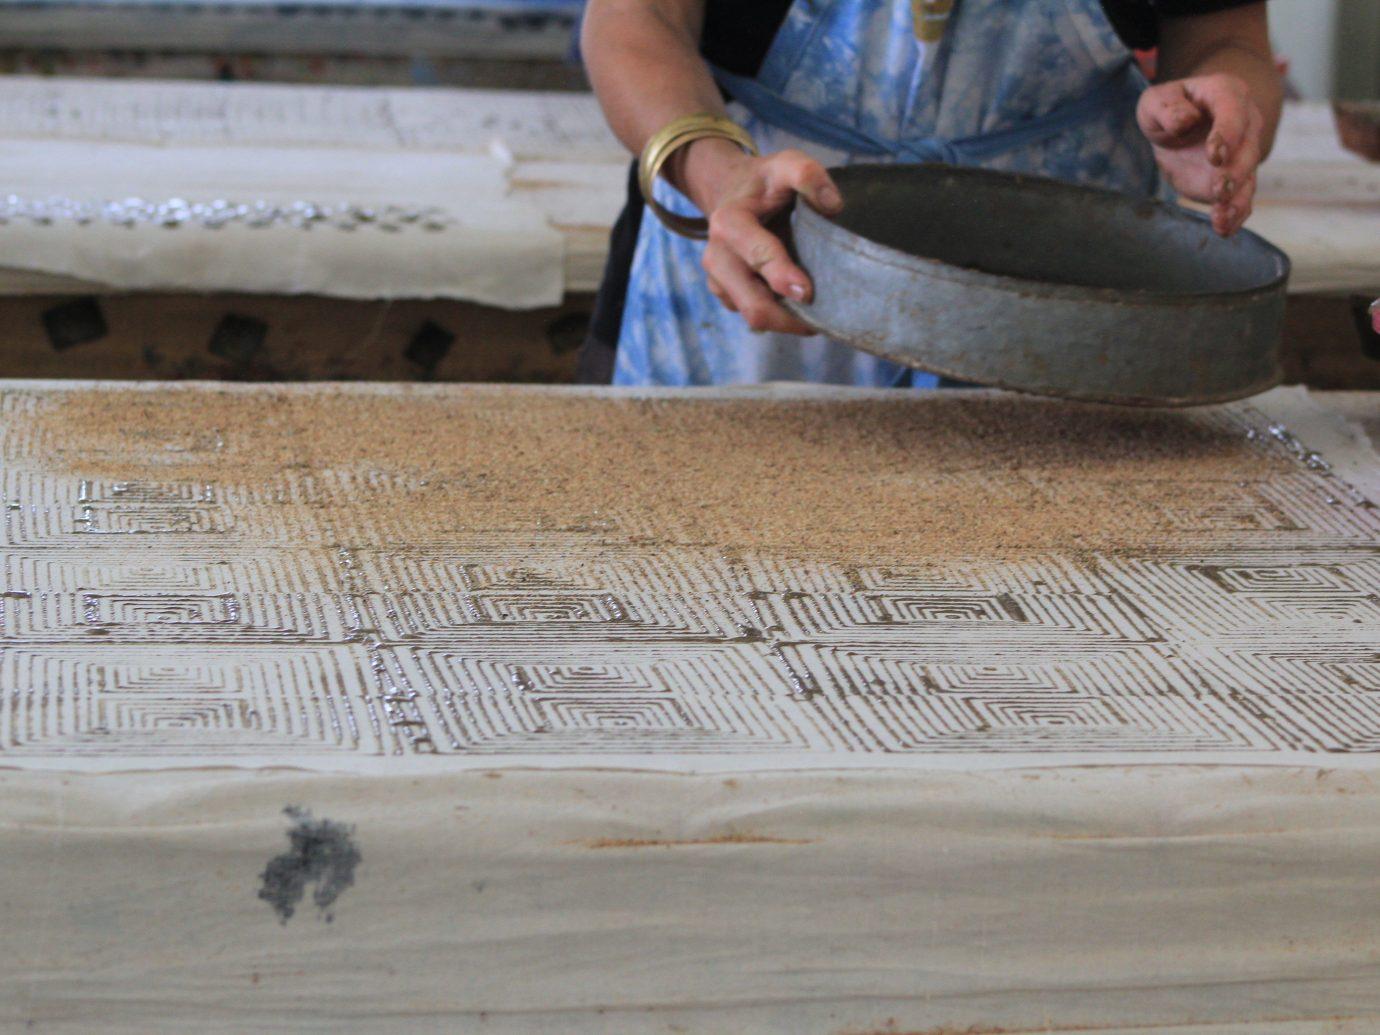 Health + Wellness Scuba Diving + Snorkeling Trip Ideas person wood art carving temple material flooring